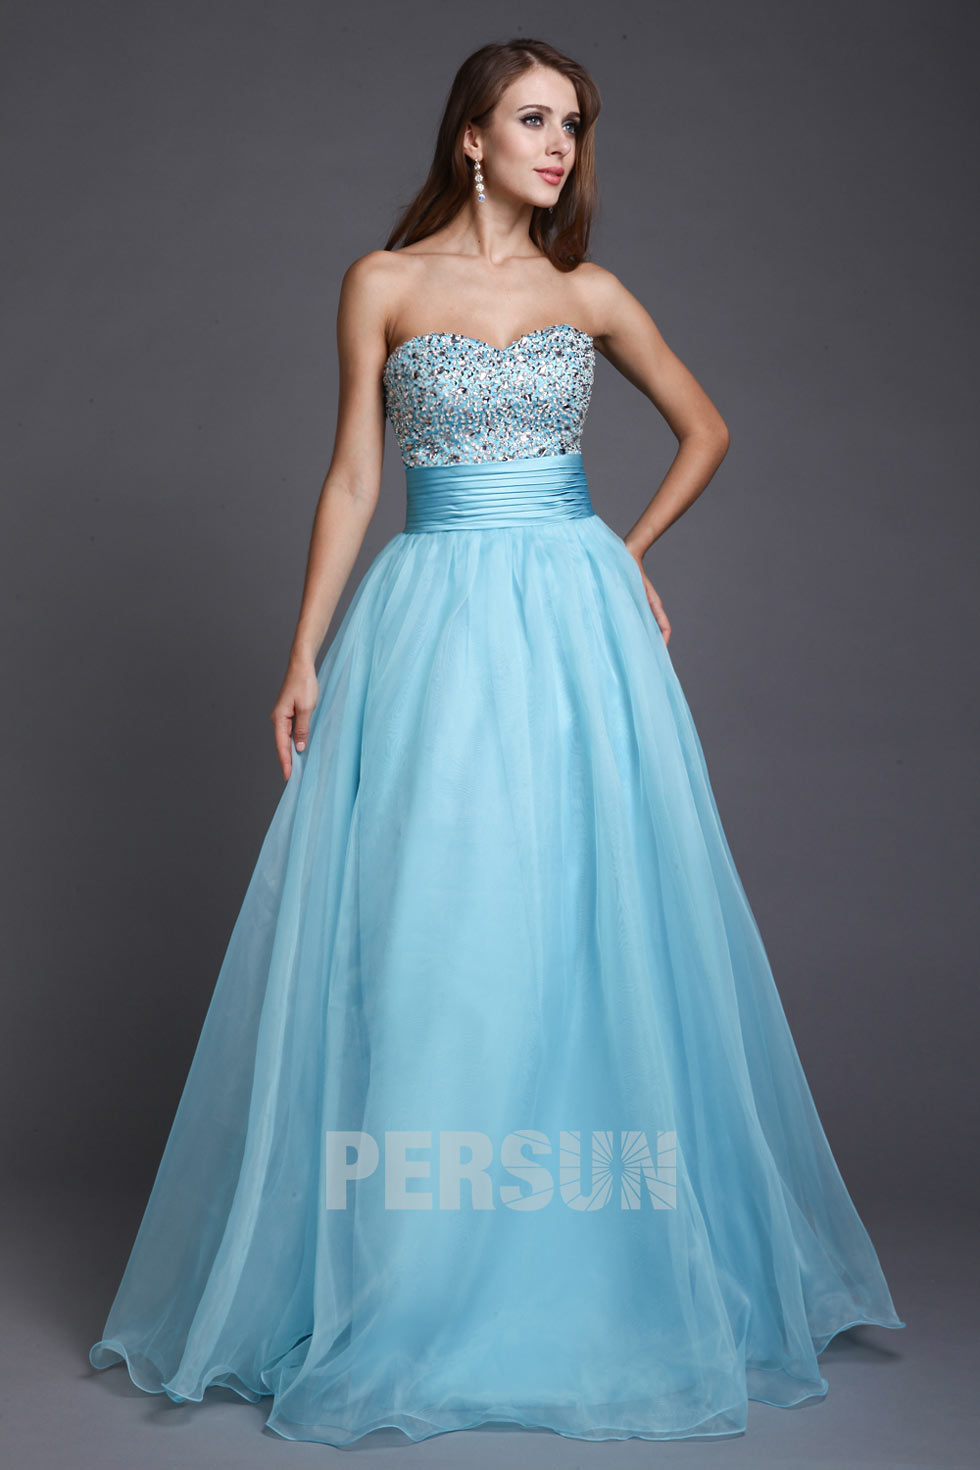 robe princesse ciel blue bustier coeur sequins